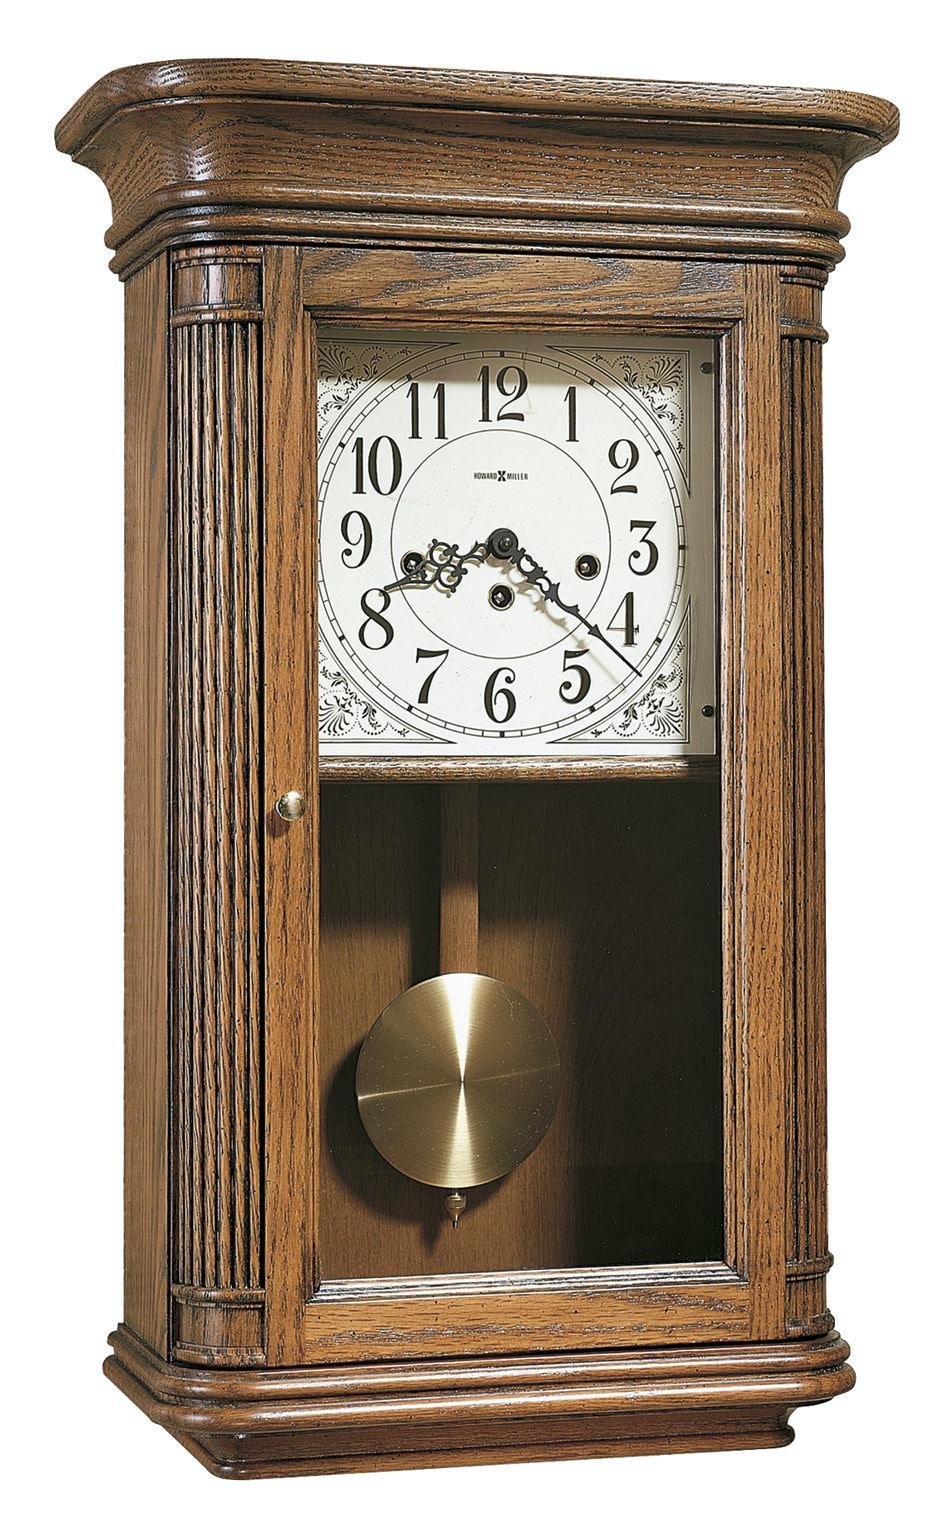 Howard miller accessories sandringham wall clock 613108 howard miller sandringham wall clock 613108 amipublicfo Gallery